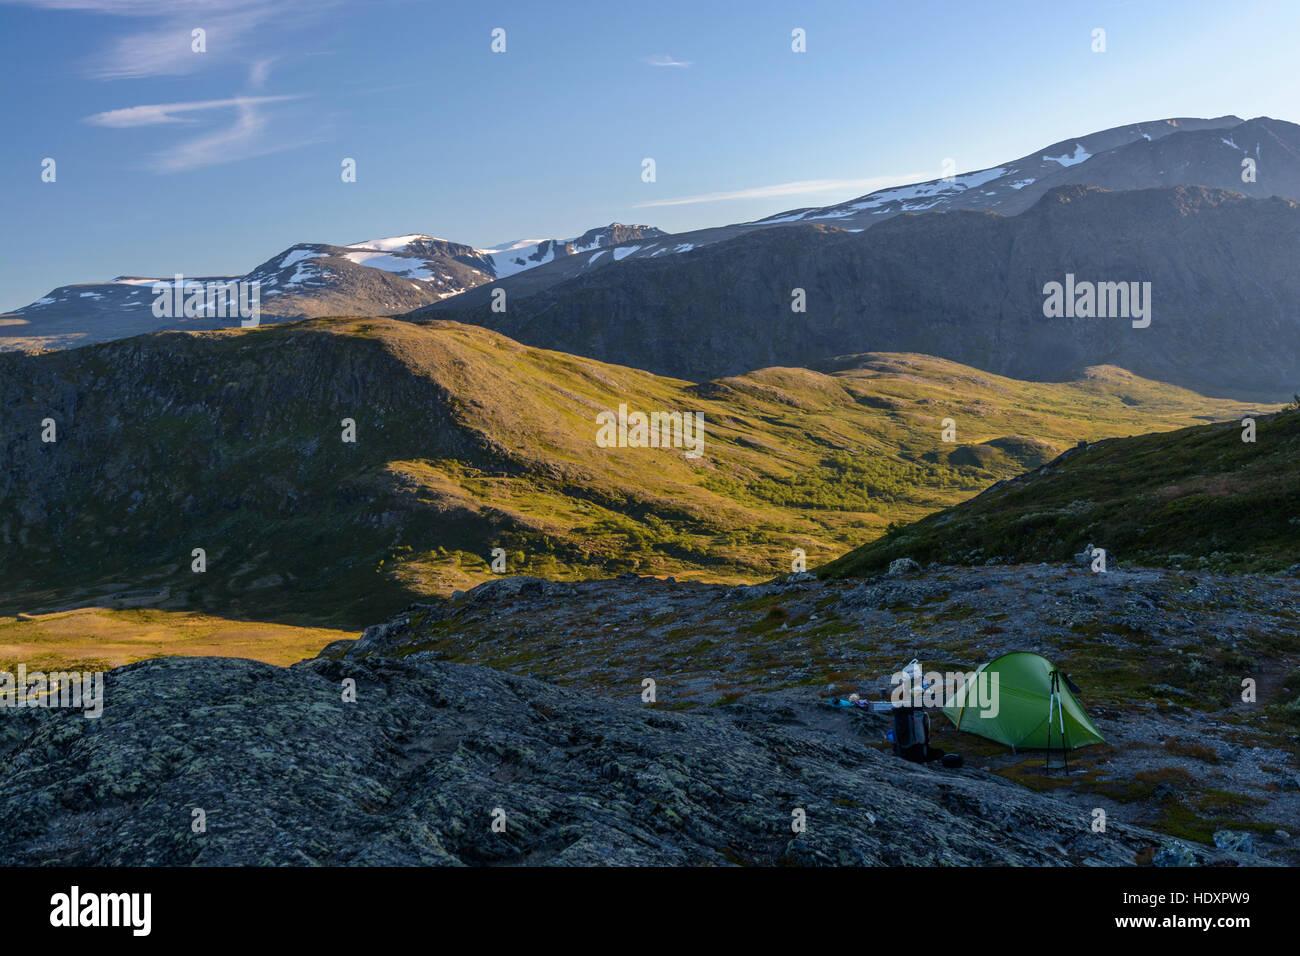 adventure ridge tent instructions